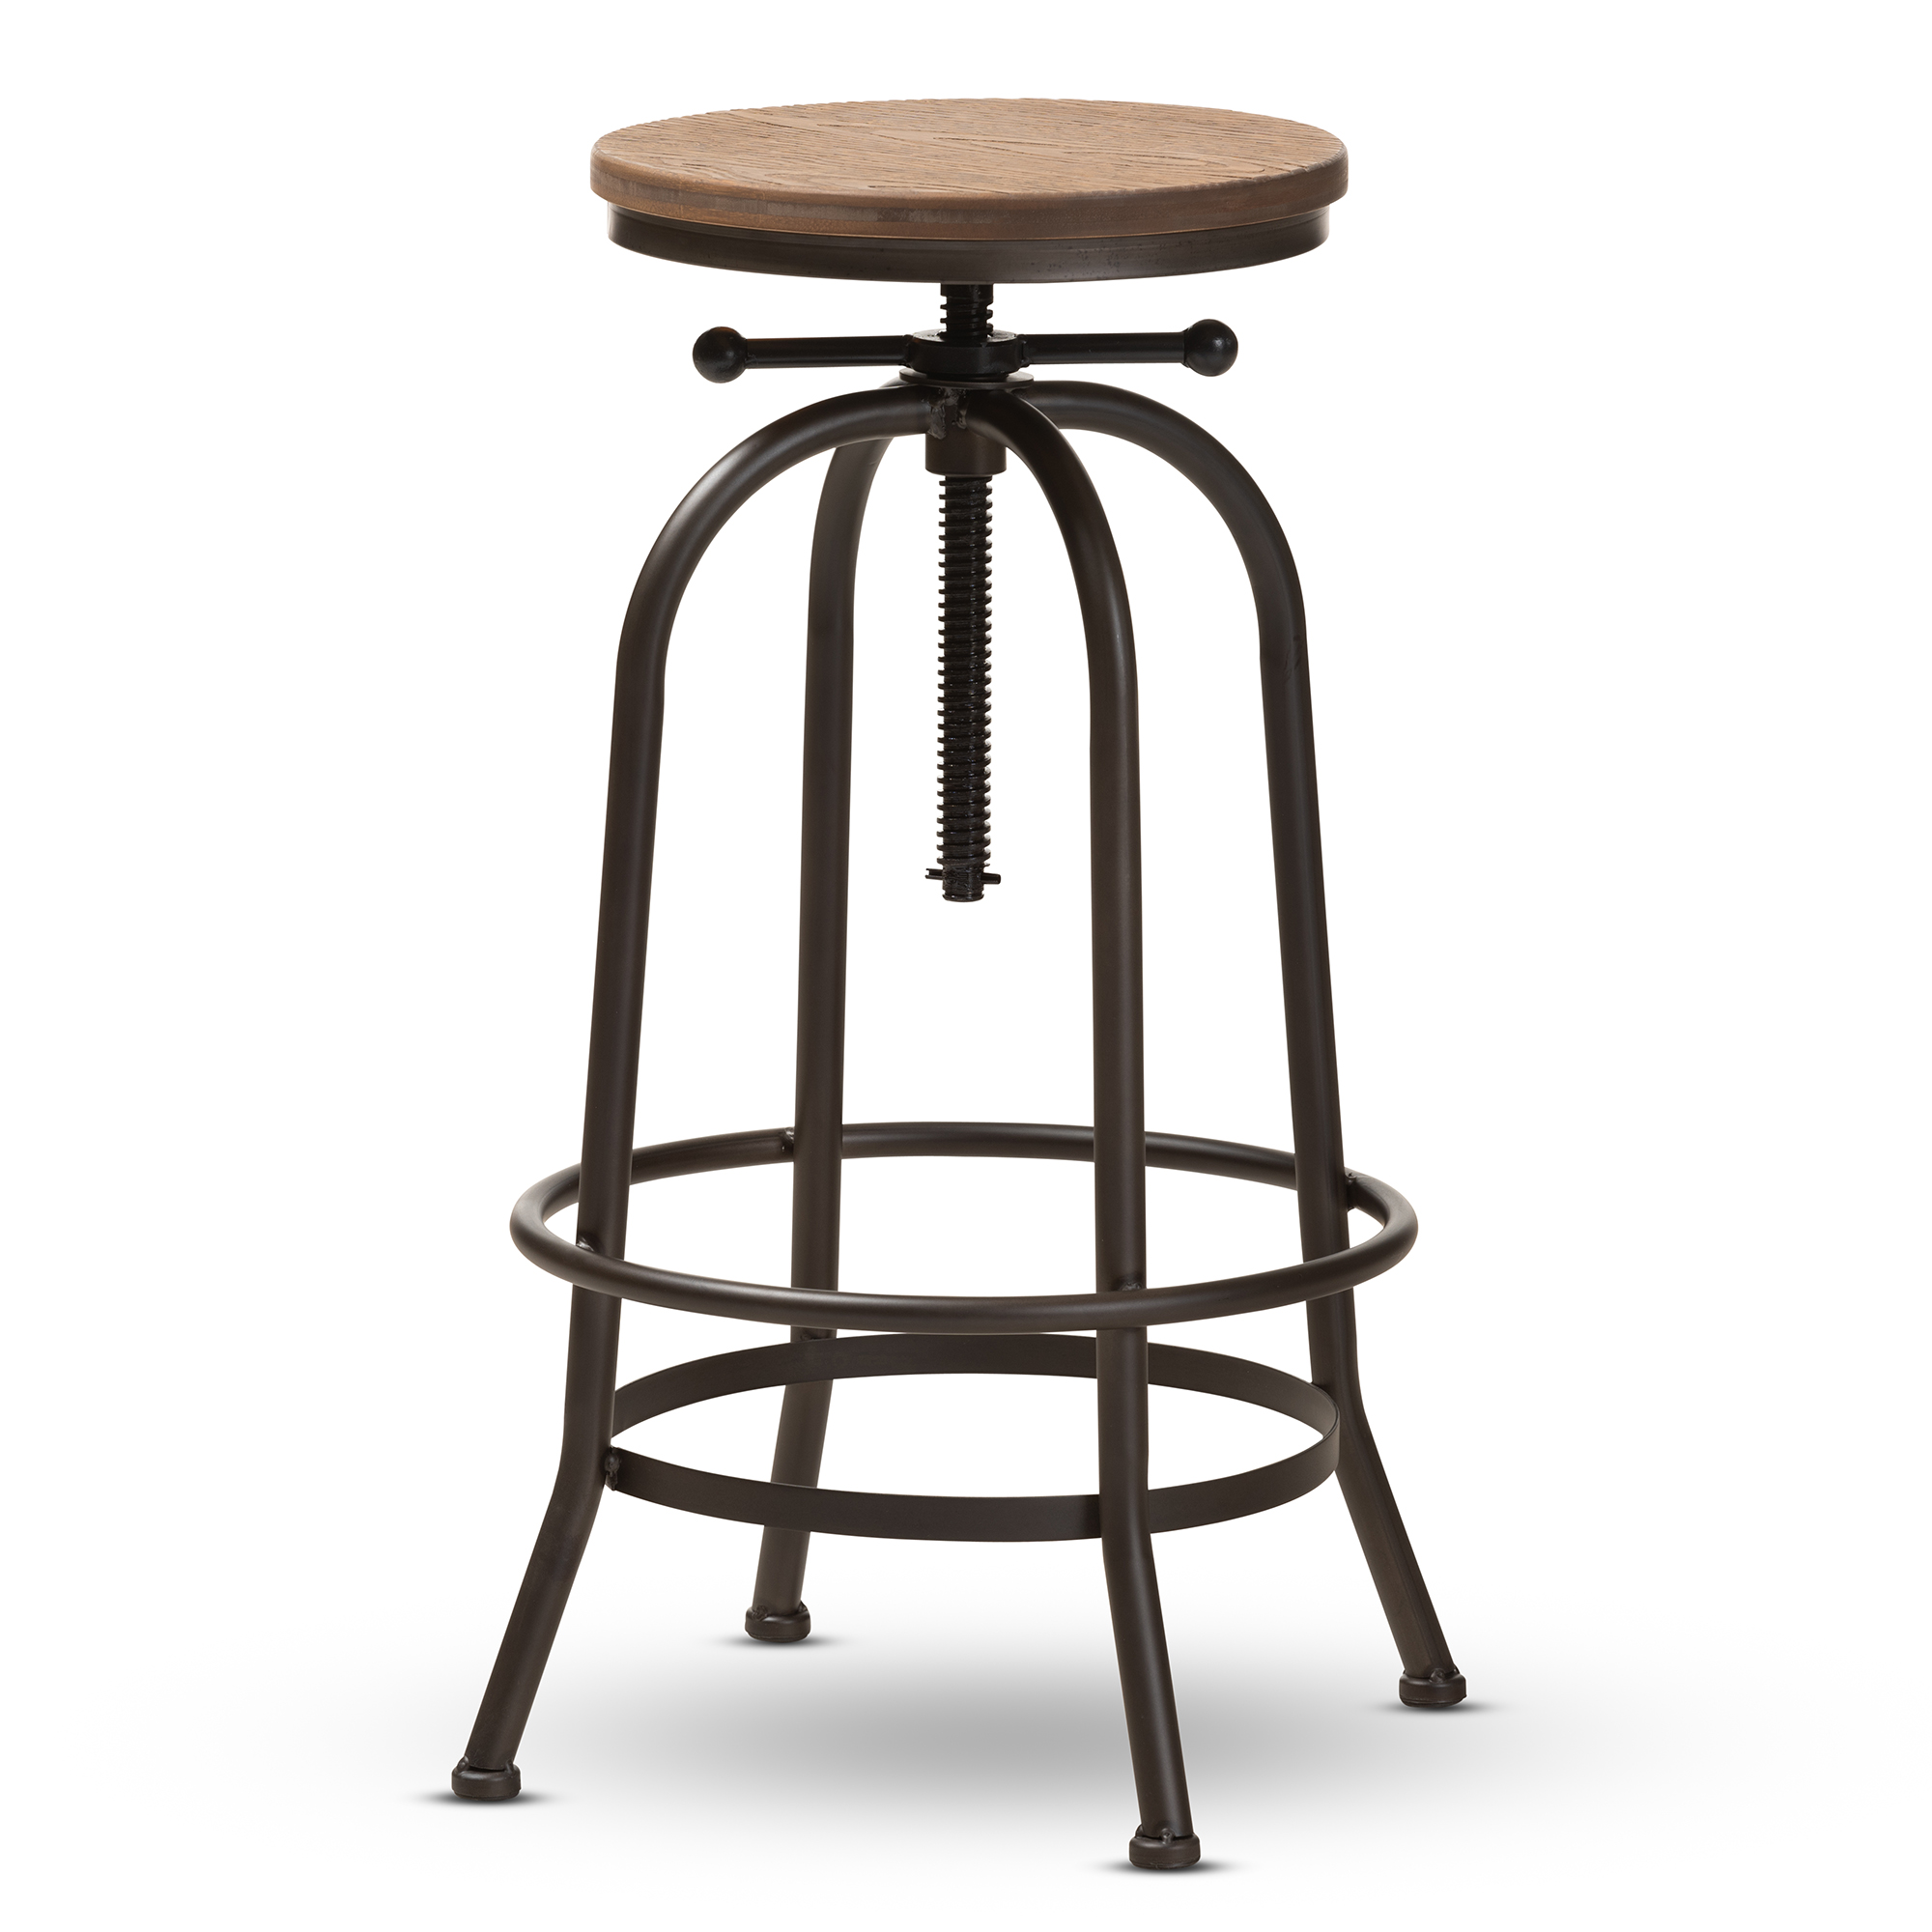 Astonishing Baxton Studio Aline Vintage Rustic Industrial Style Wood And Inzonedesignstudio Interior Chair Design Inzonedesignstudiocom